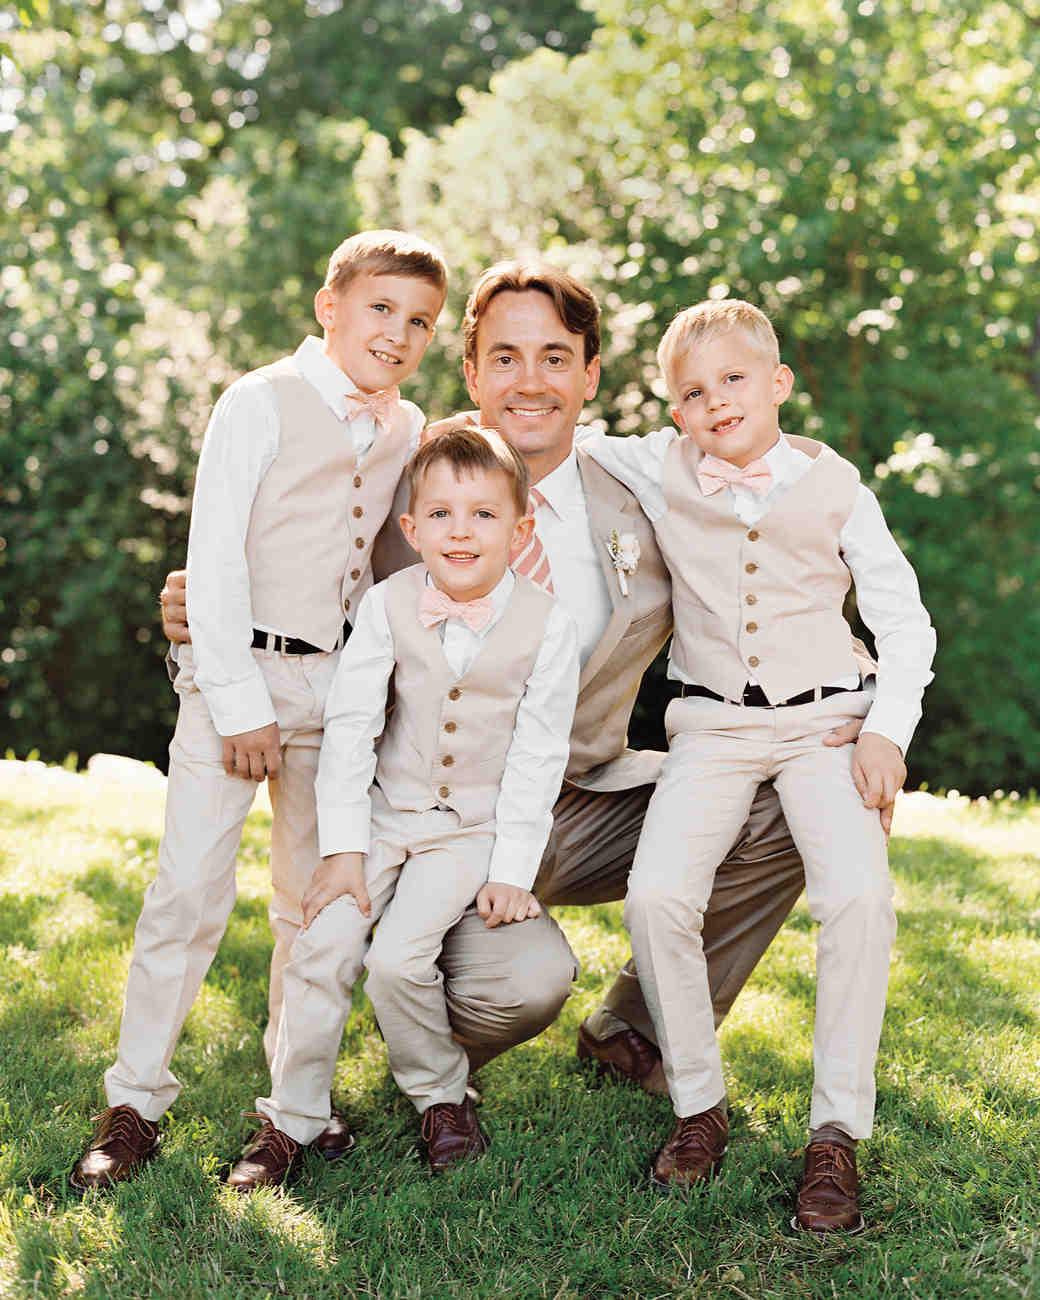 joanna-kyle-real-weddings-groom-sons-009026-r1-012-d111223.jpg